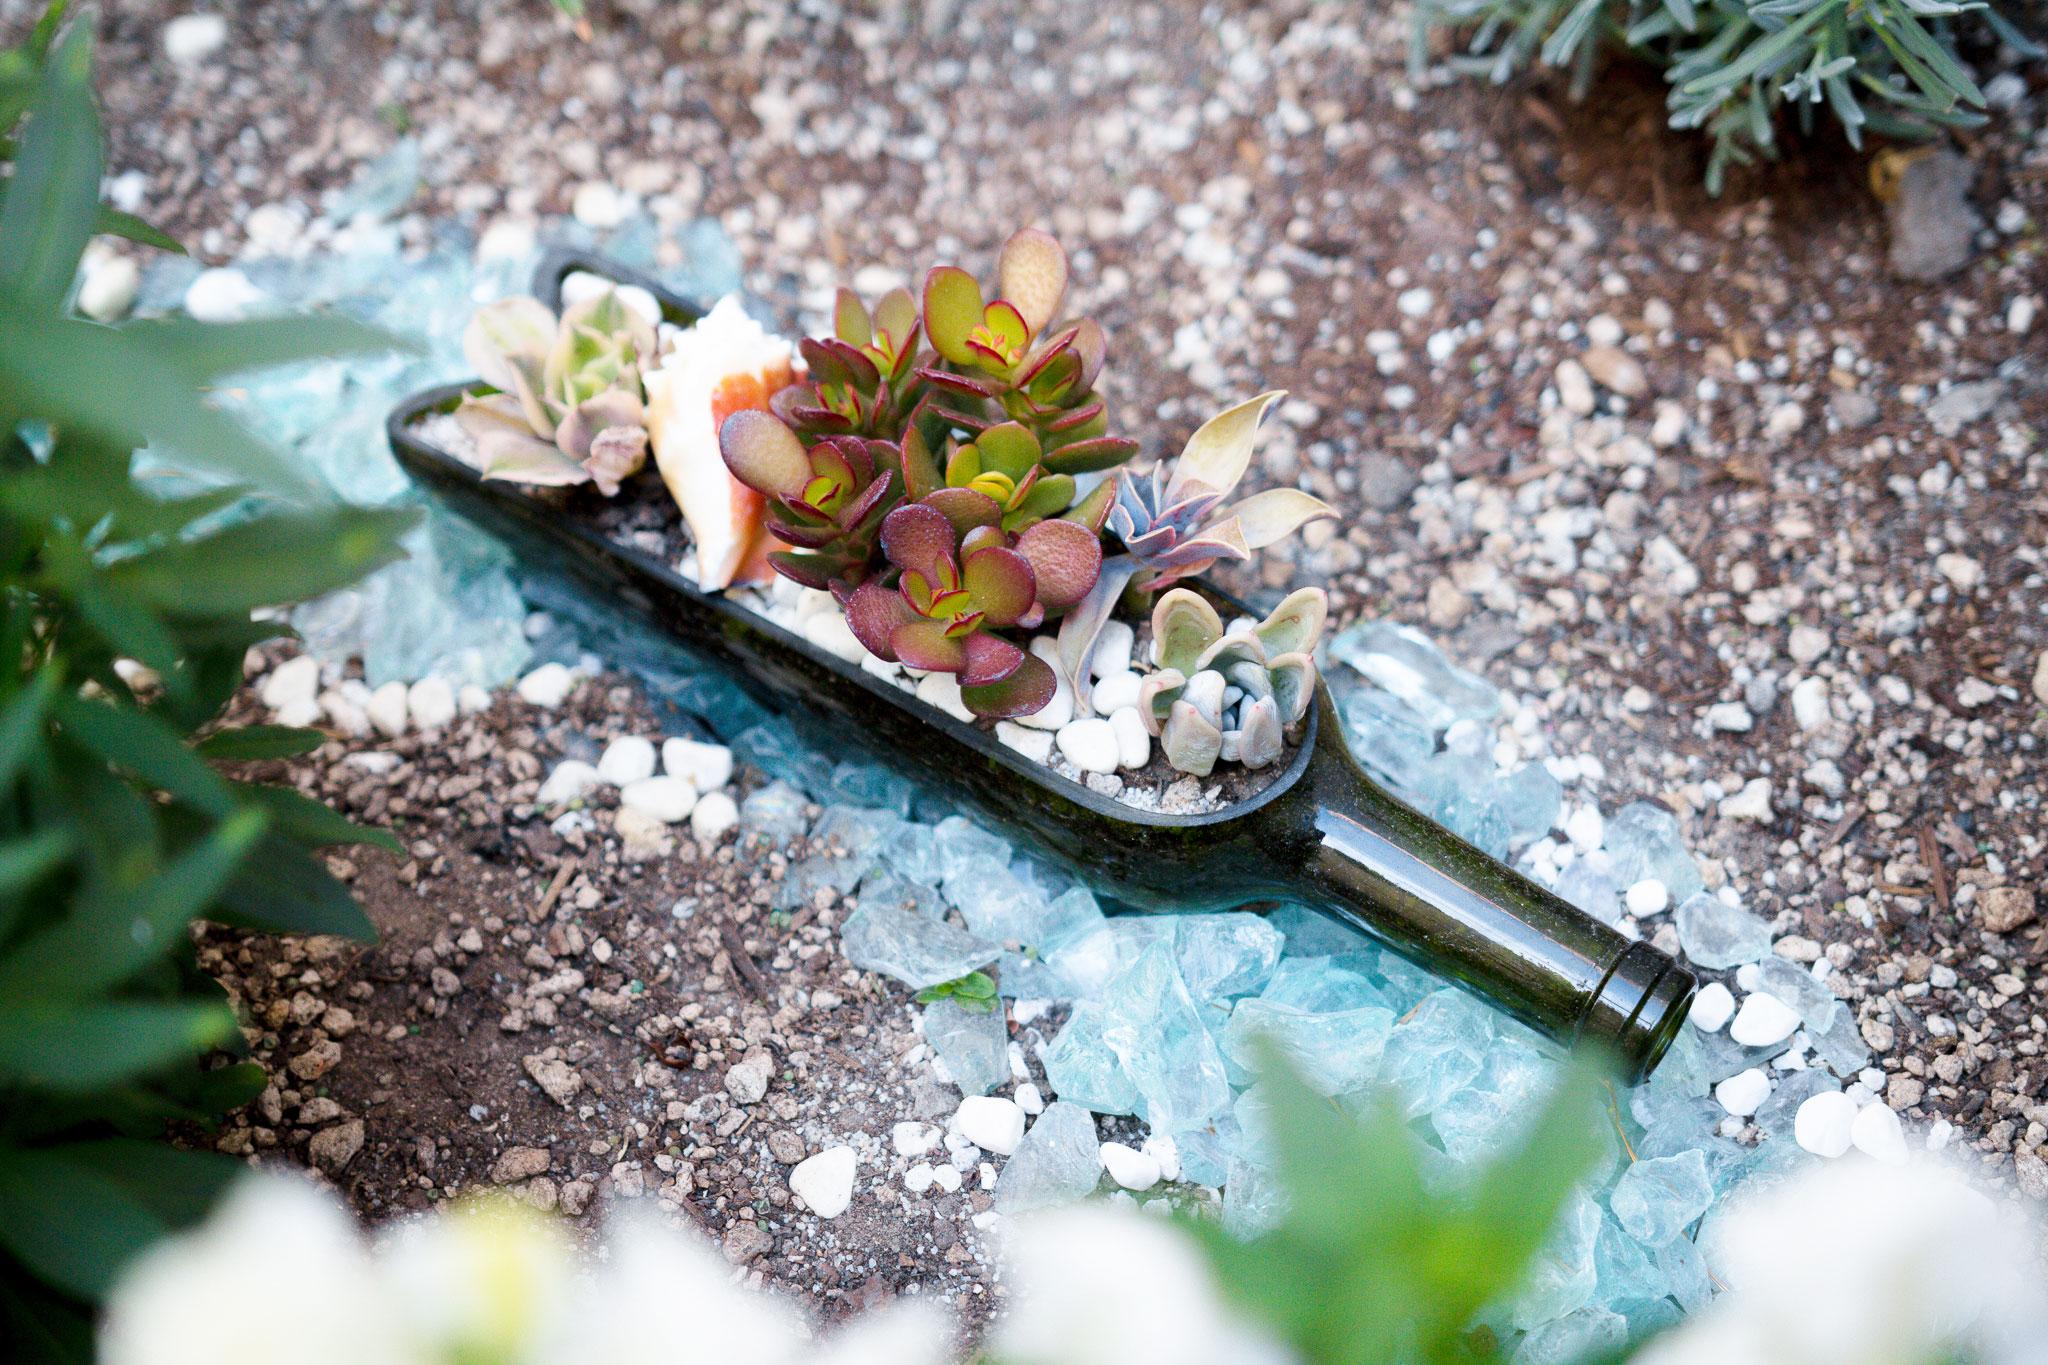 Adelya_Tumasyeva_the-garden-project_8.jpg